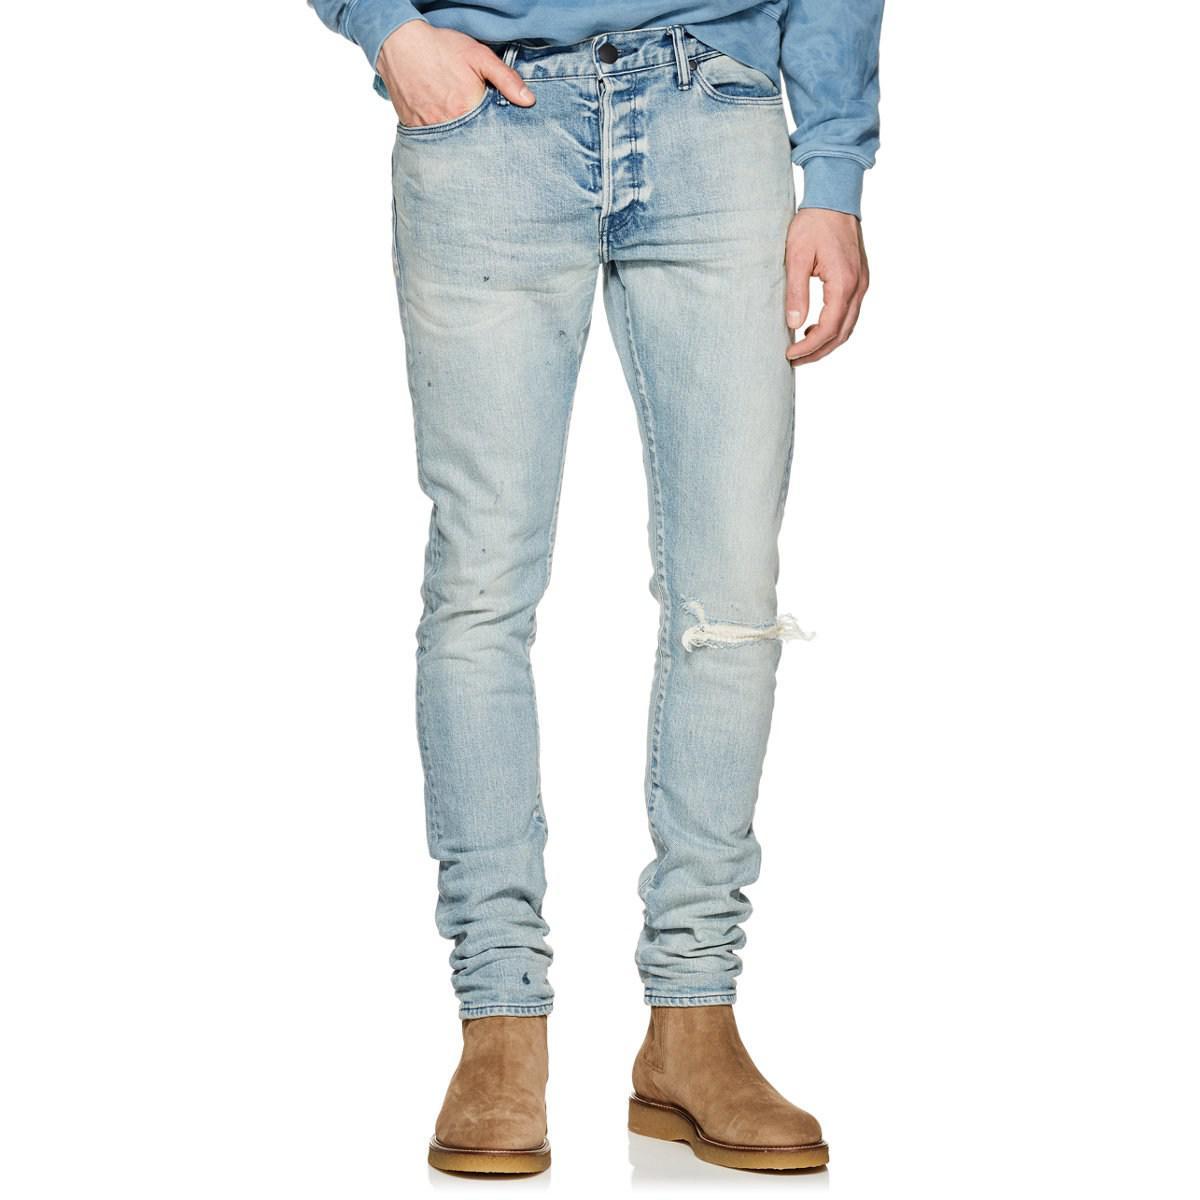 d4b6afe4 Lyst - John Elliott Cast 2 Distressed Slim Jeans in Blue for Men